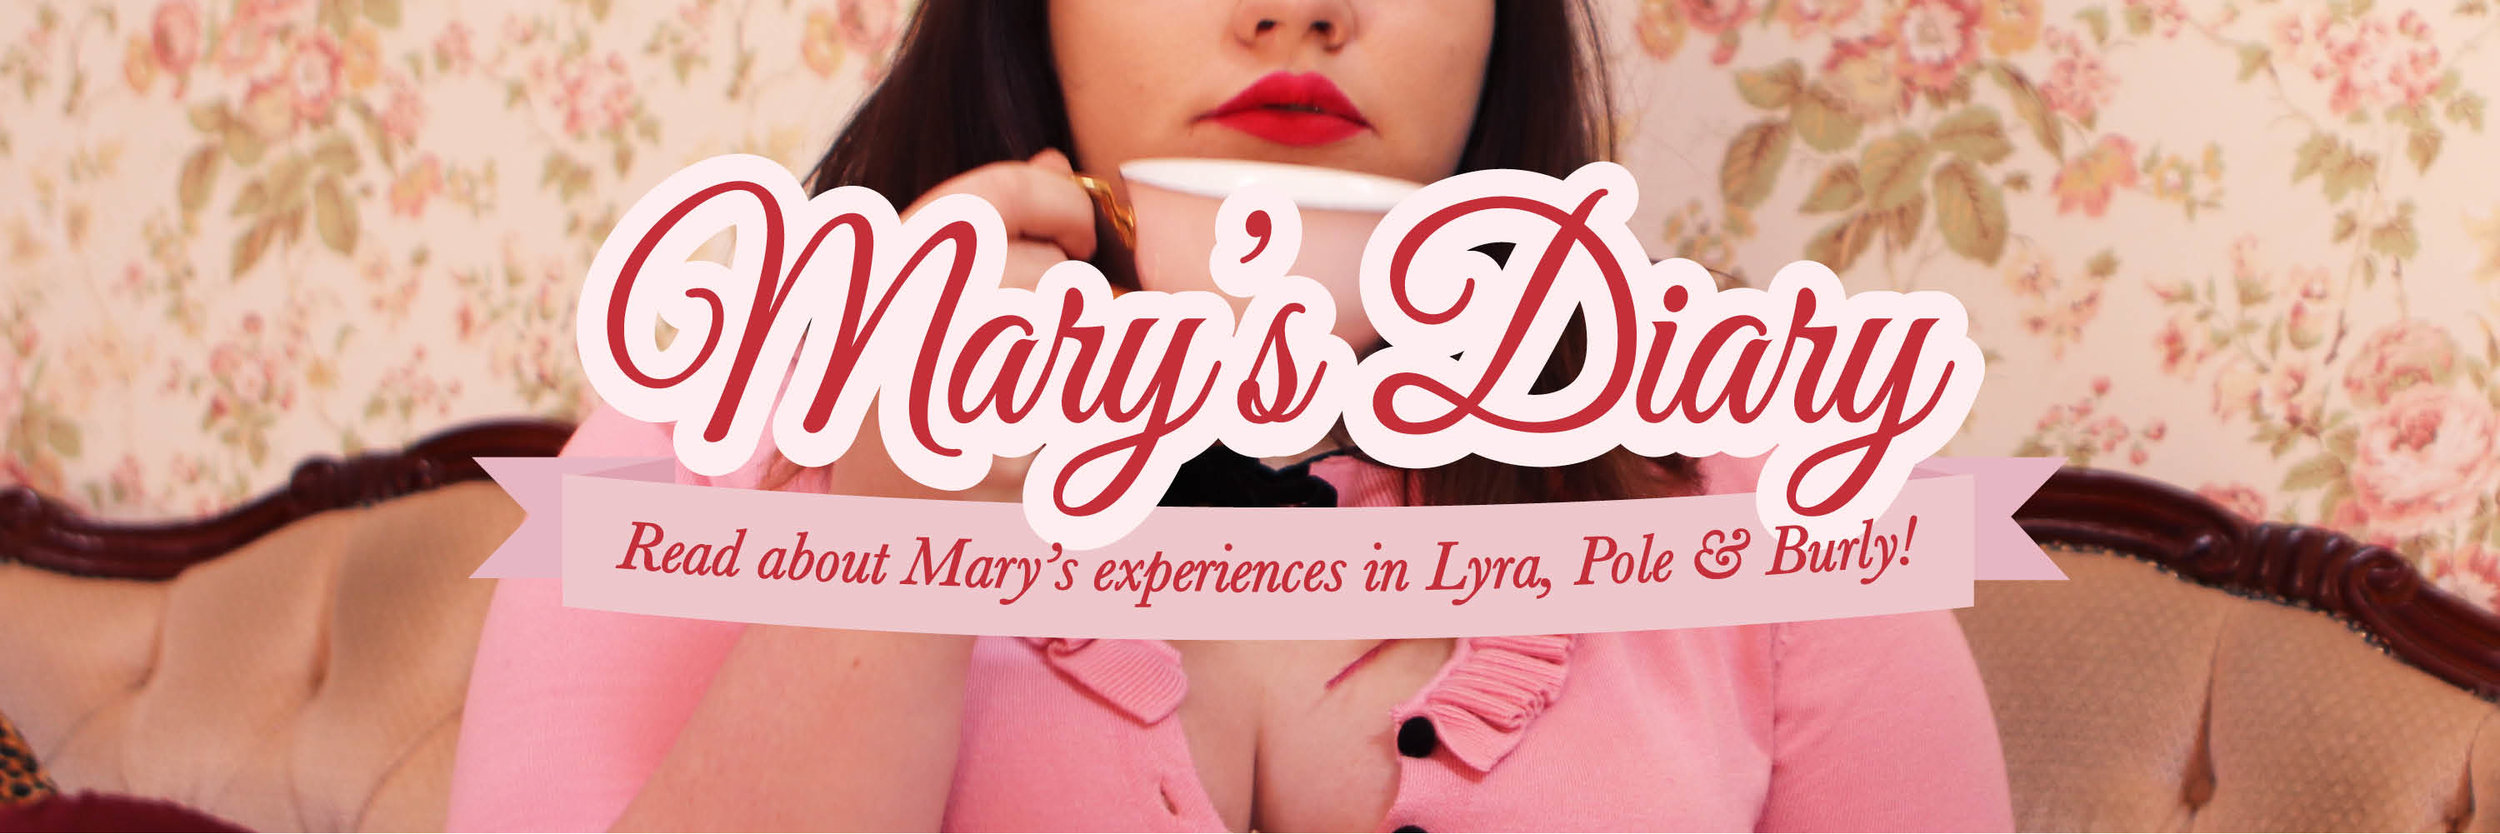 marys-dary-banner.jpg